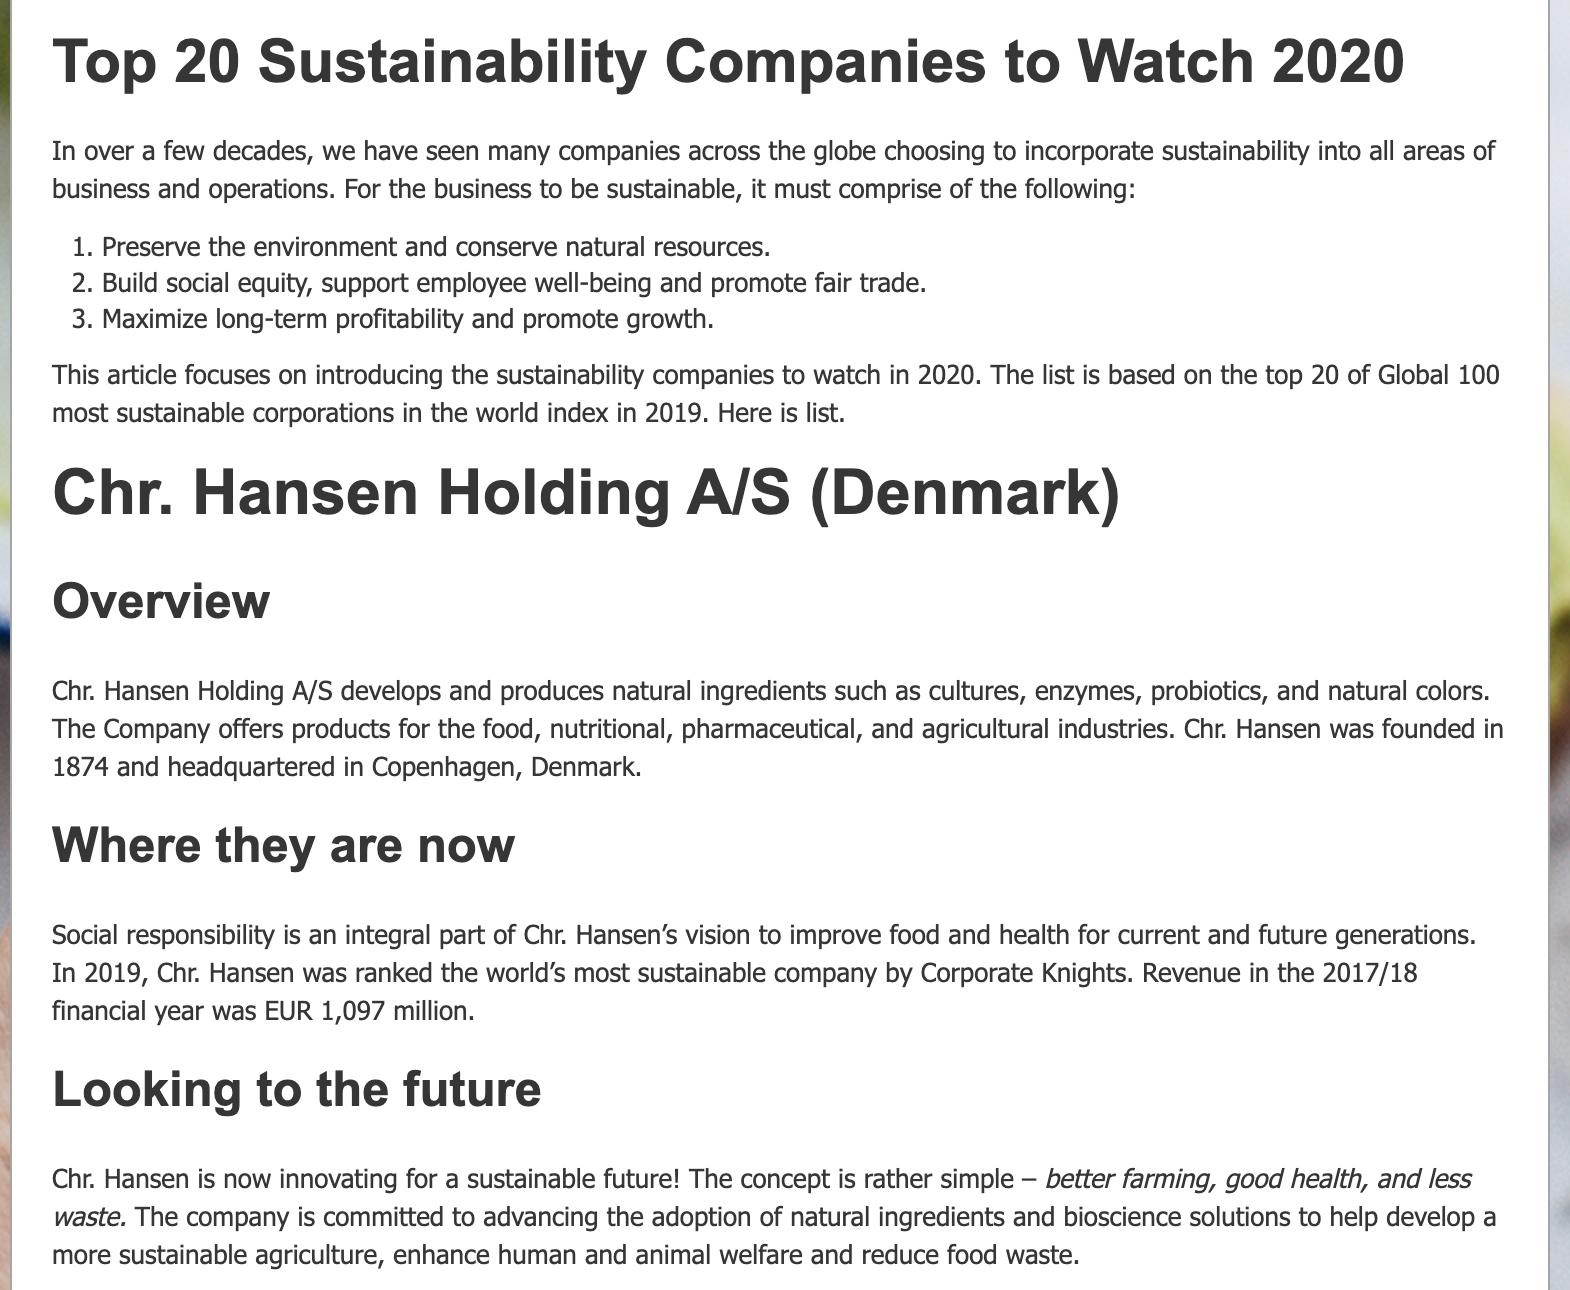 ecopruner top 20 sustainability companies